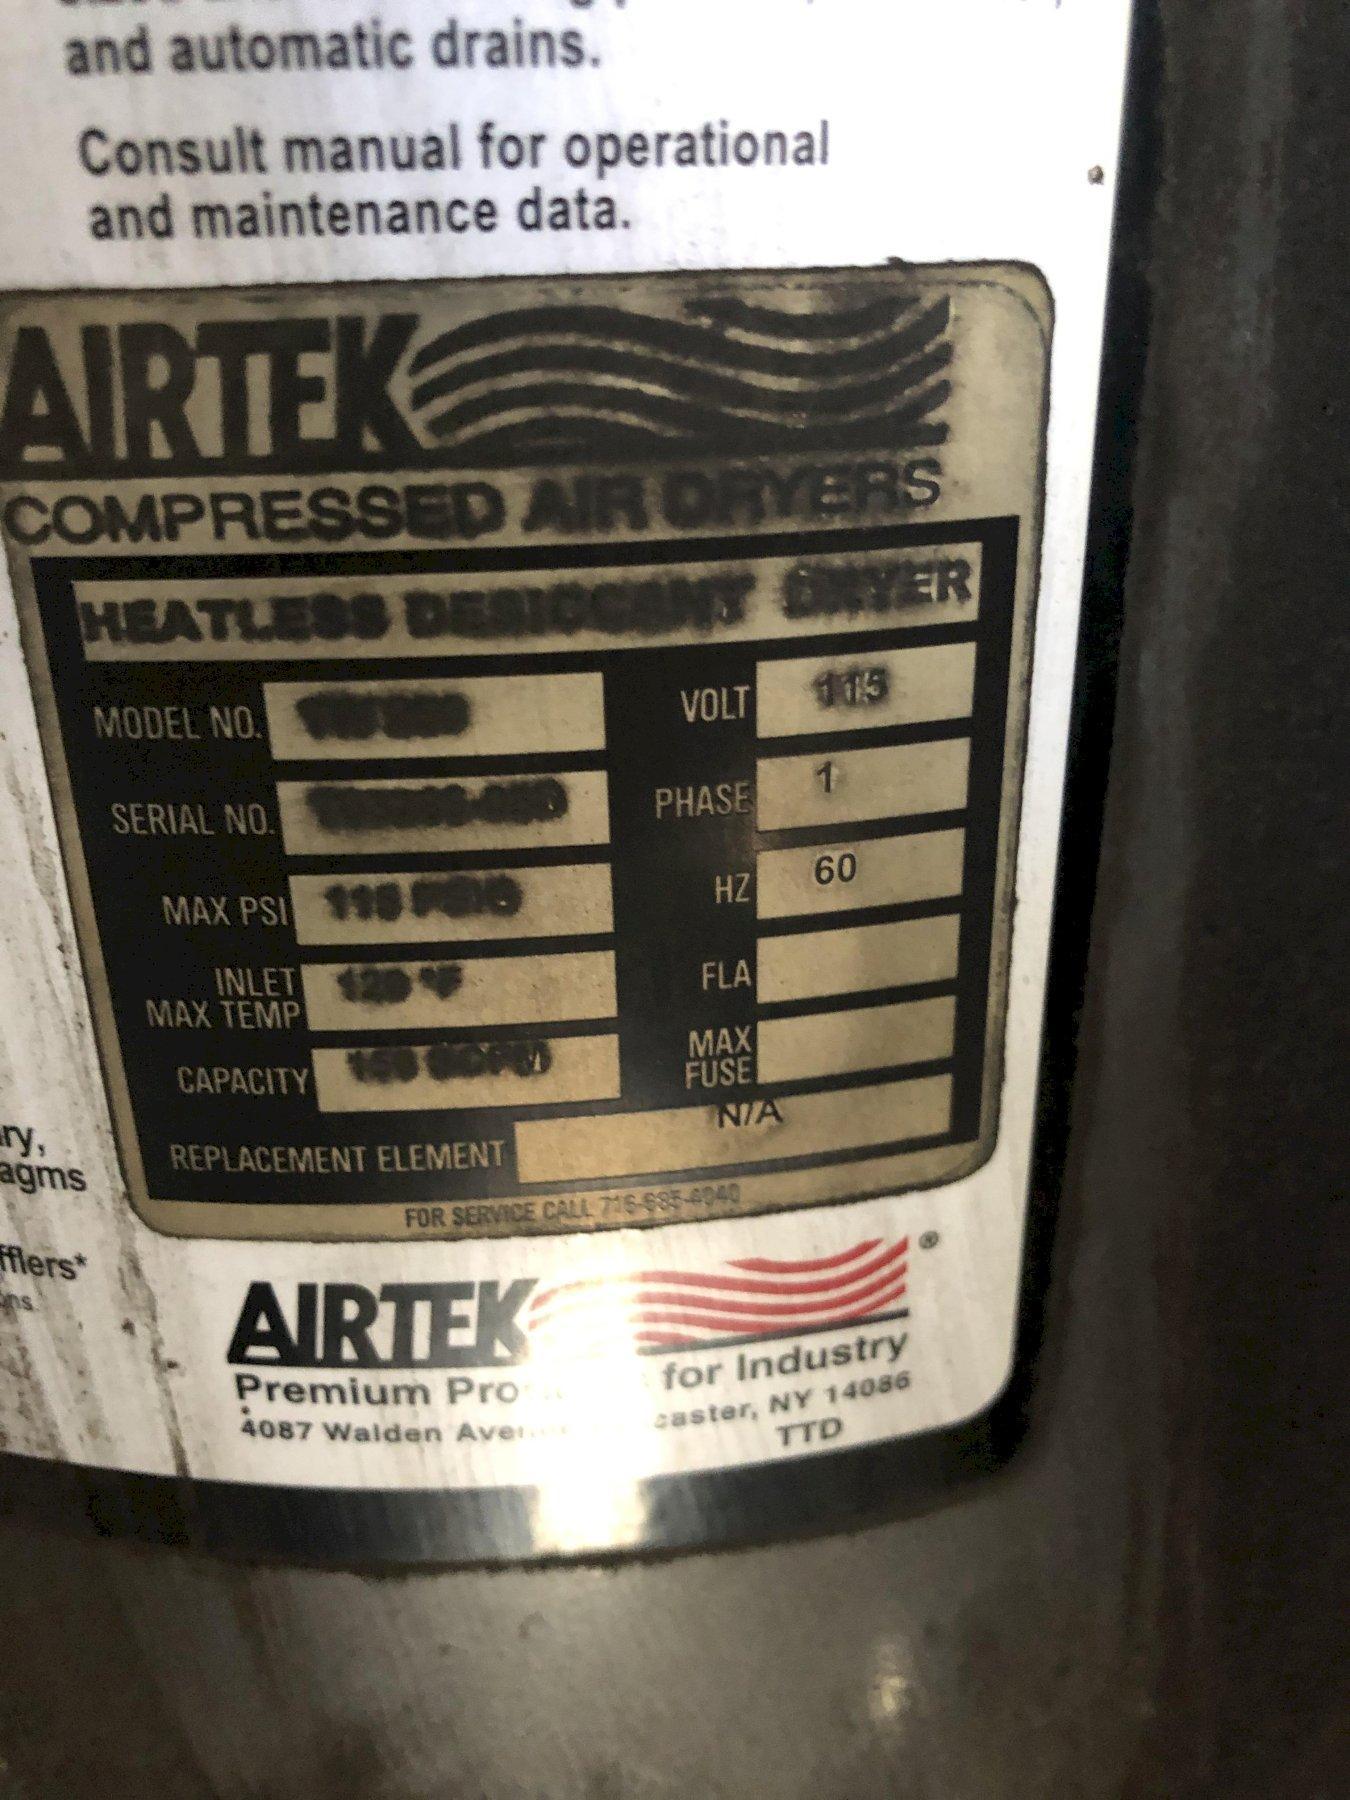 Airtek heatless desiccant air dryer model tw 250 s/n ? rated at 150 scfm and air receiver 3' x 8' tall